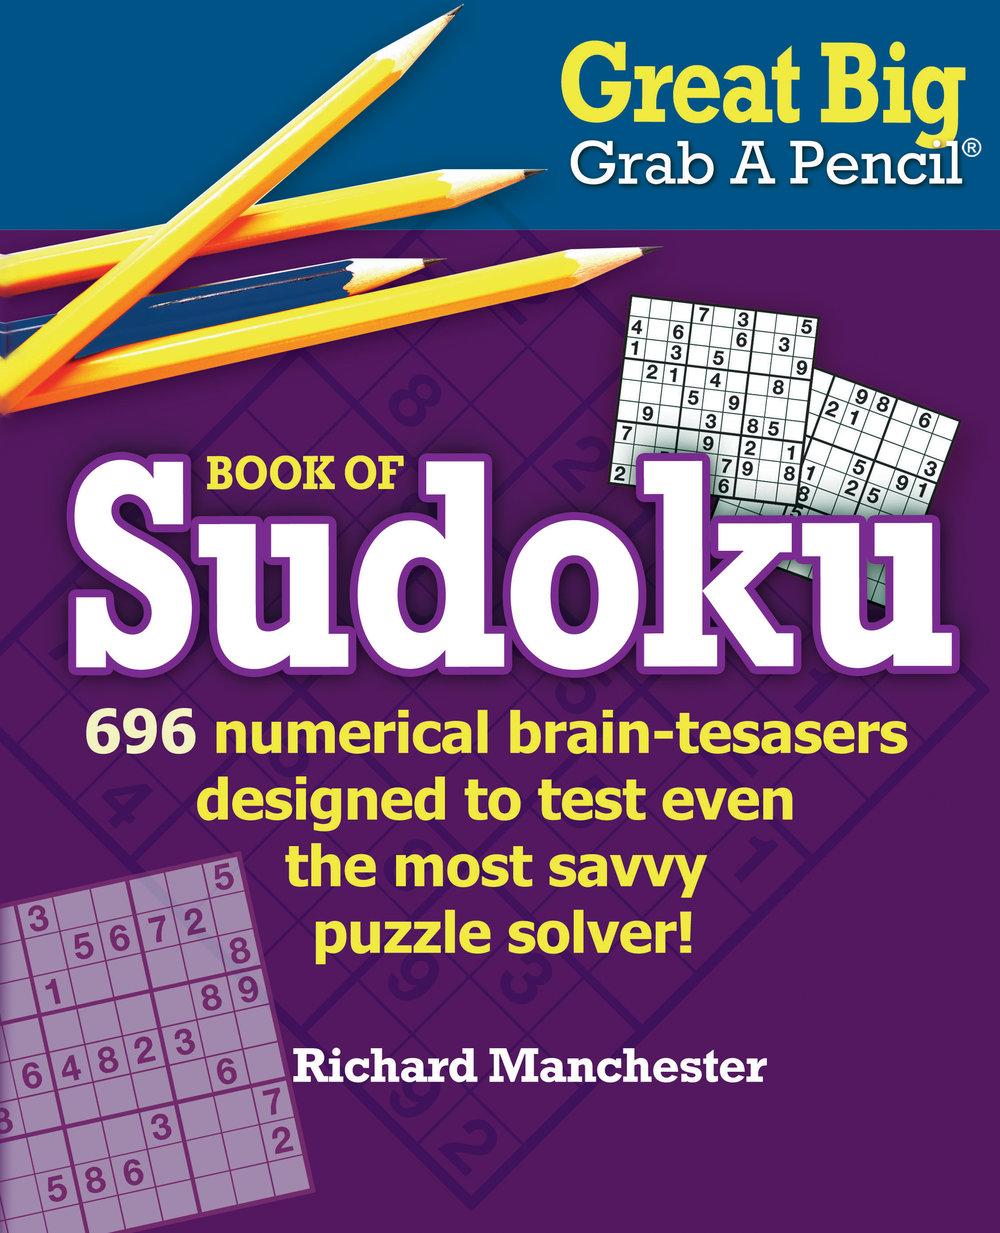 GreatB.GAP Sudoku Puz.jpg